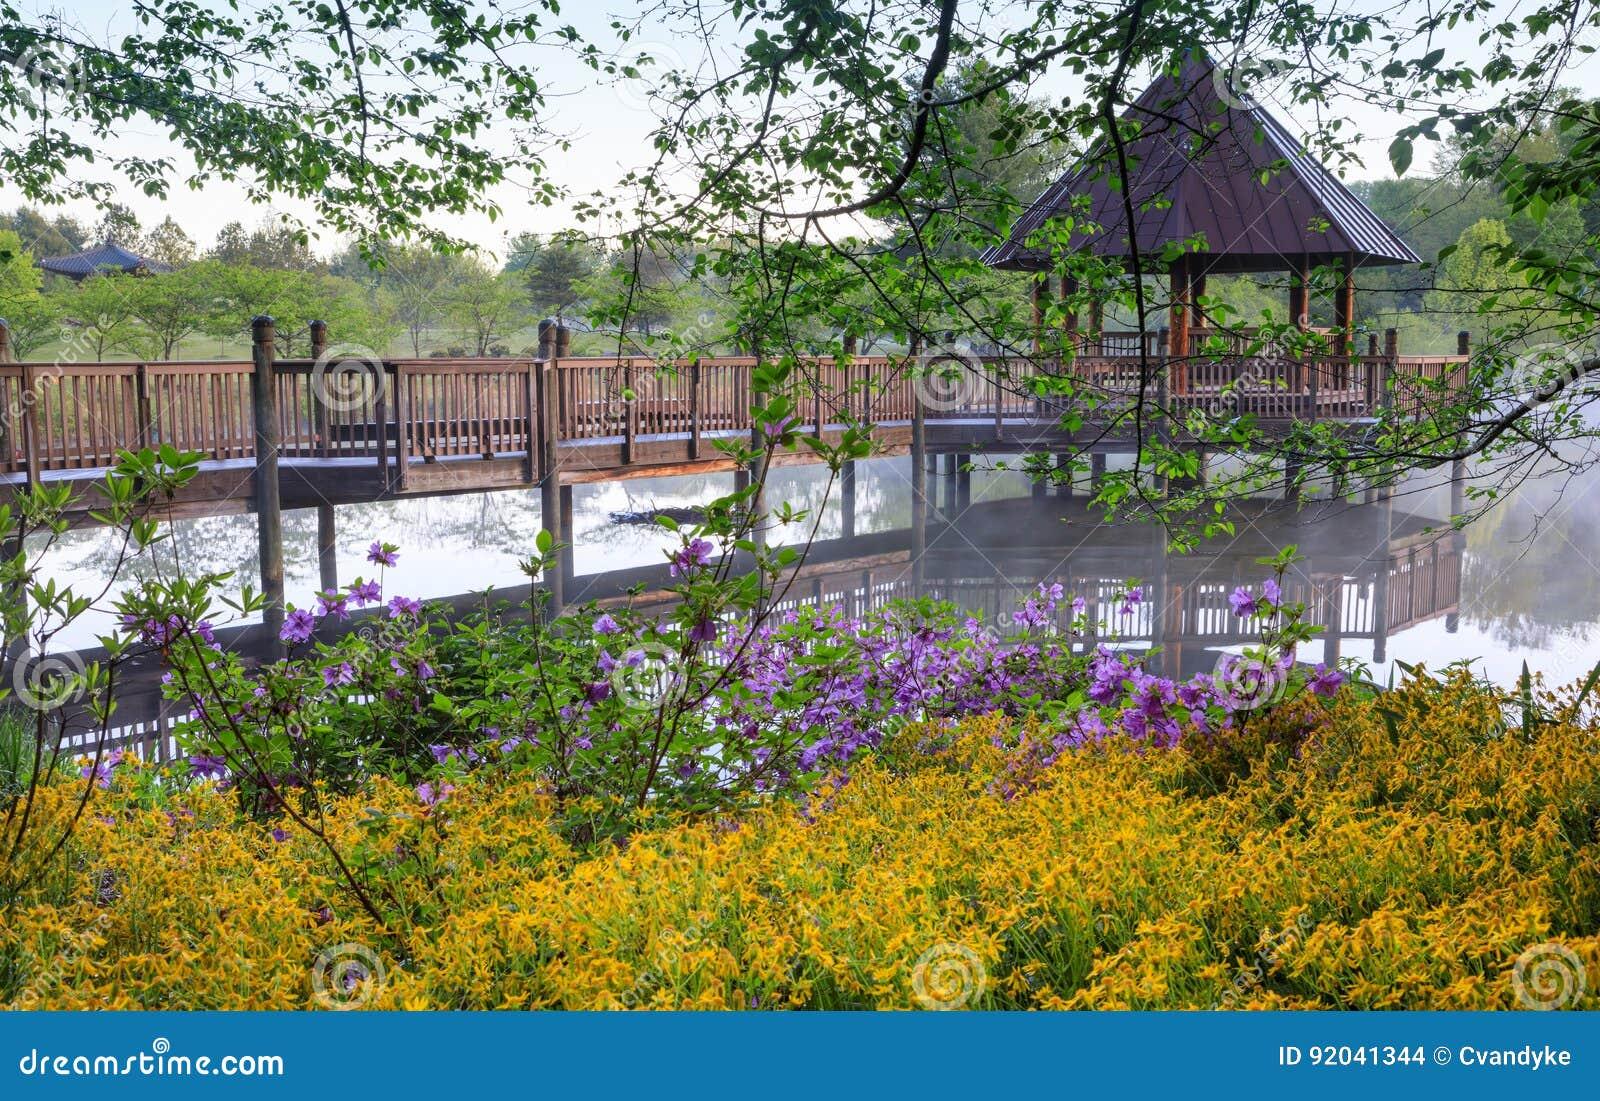 Miradouro no lago nevoento cercado por flores da mola